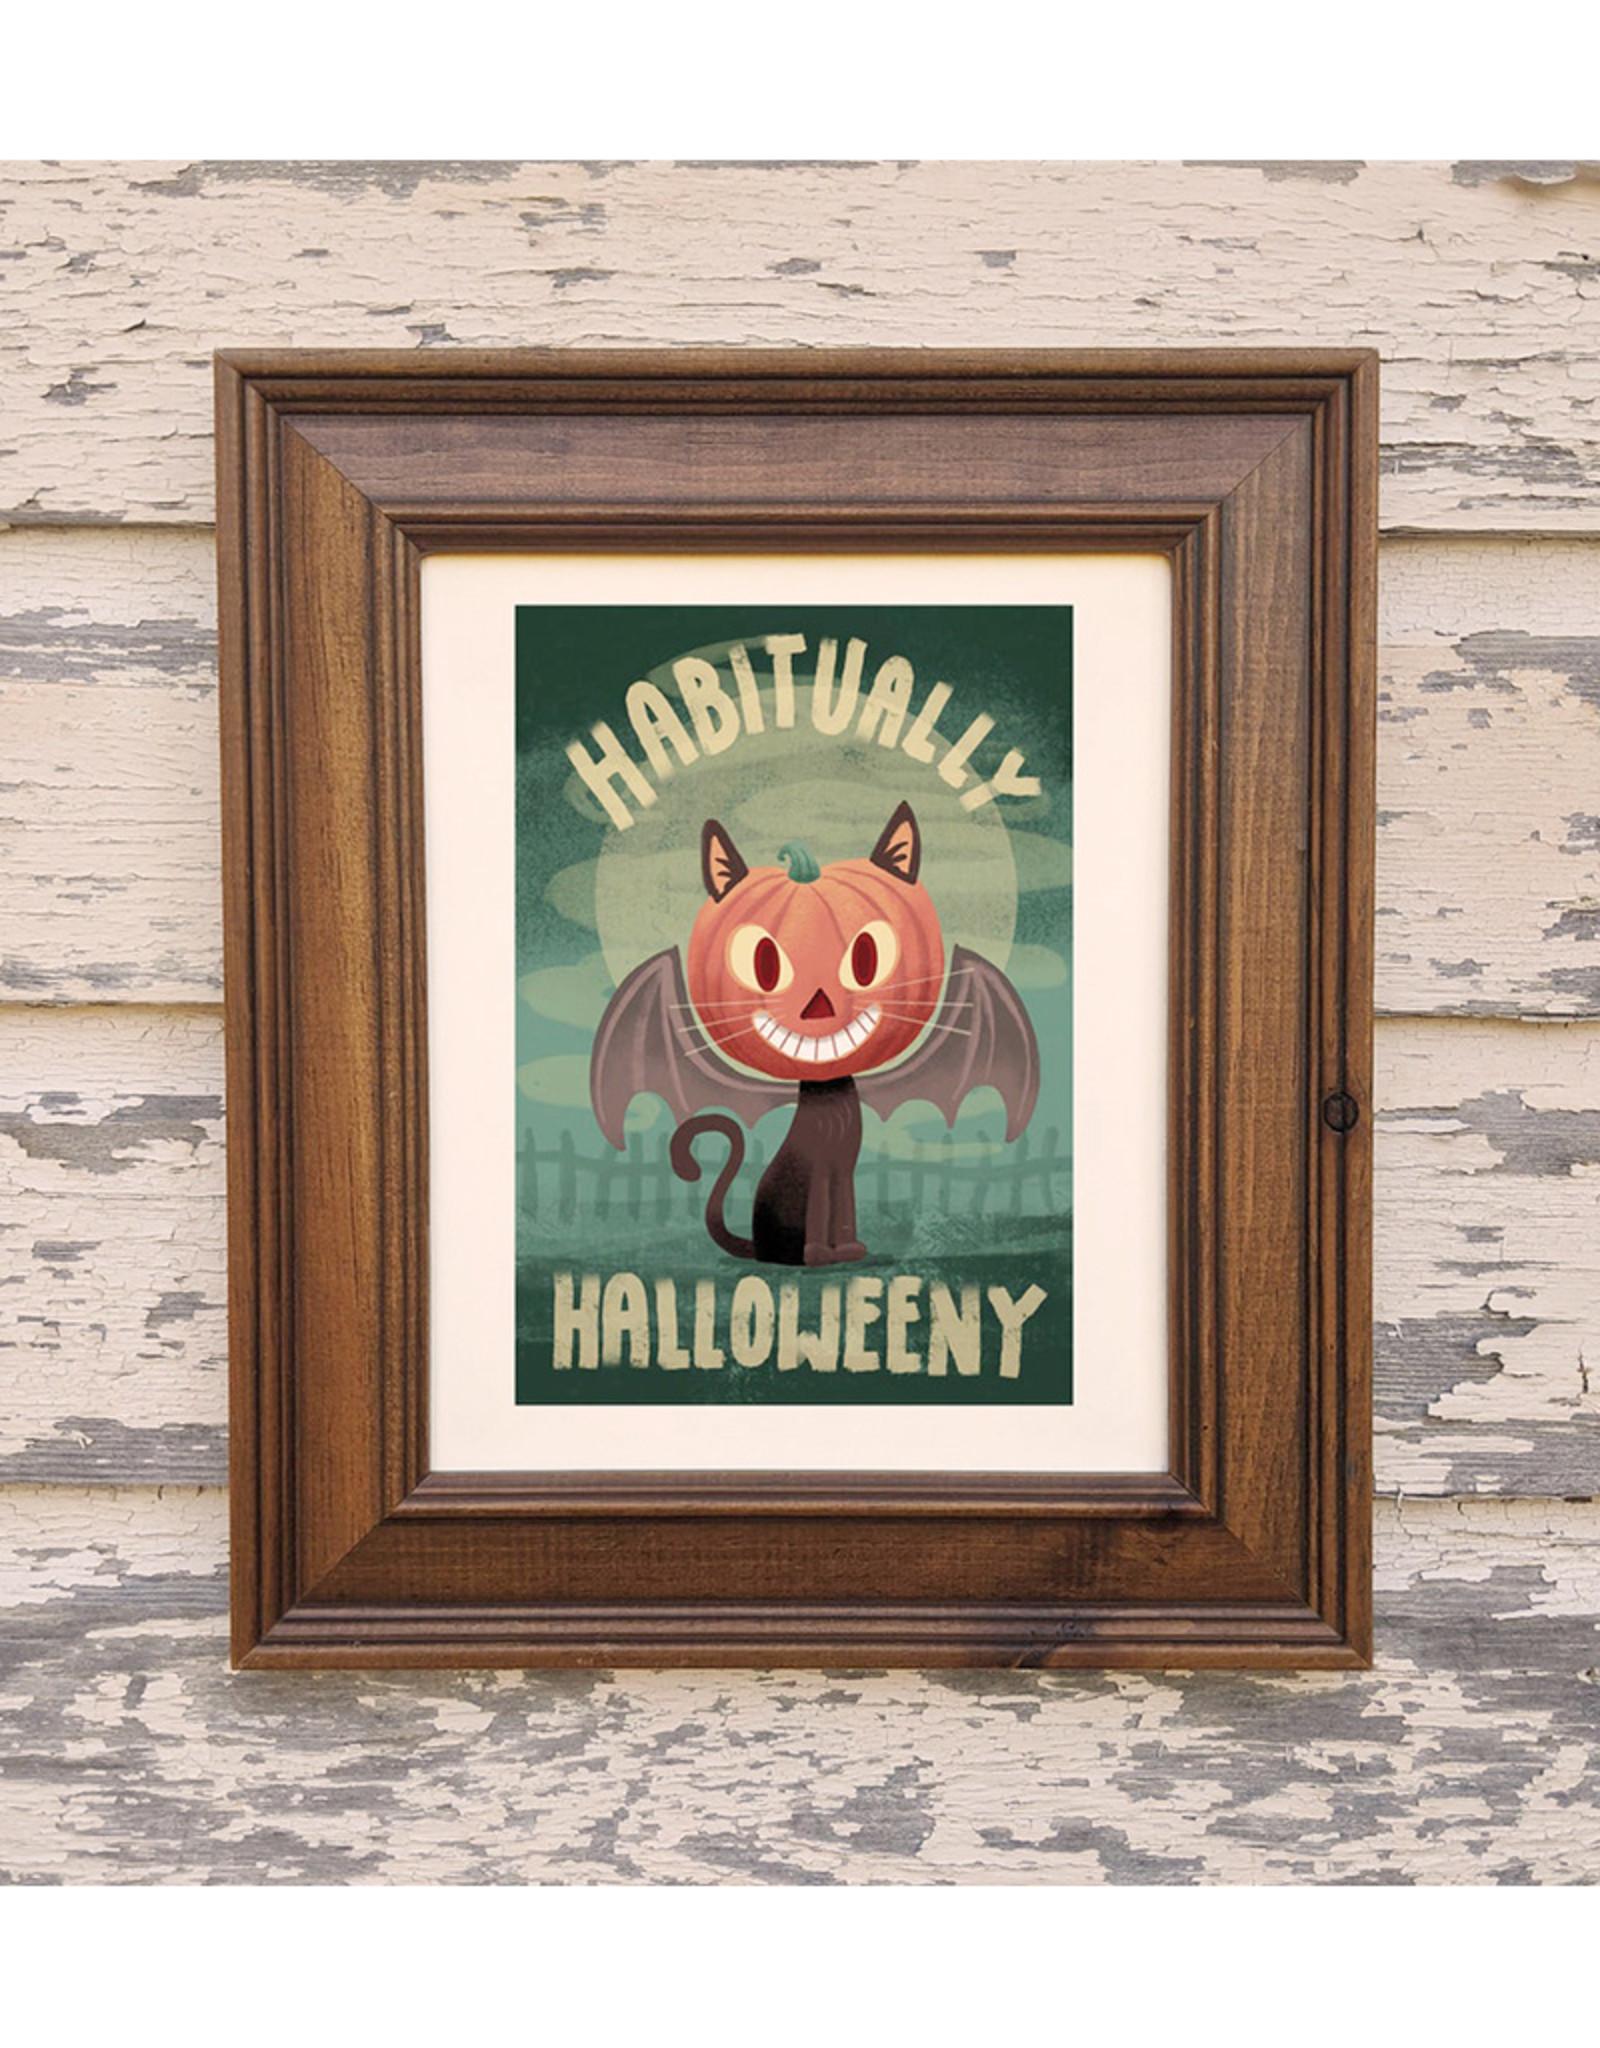 Matthew Hawkins Habitually Halloween-y Prints by Matt Hawkins